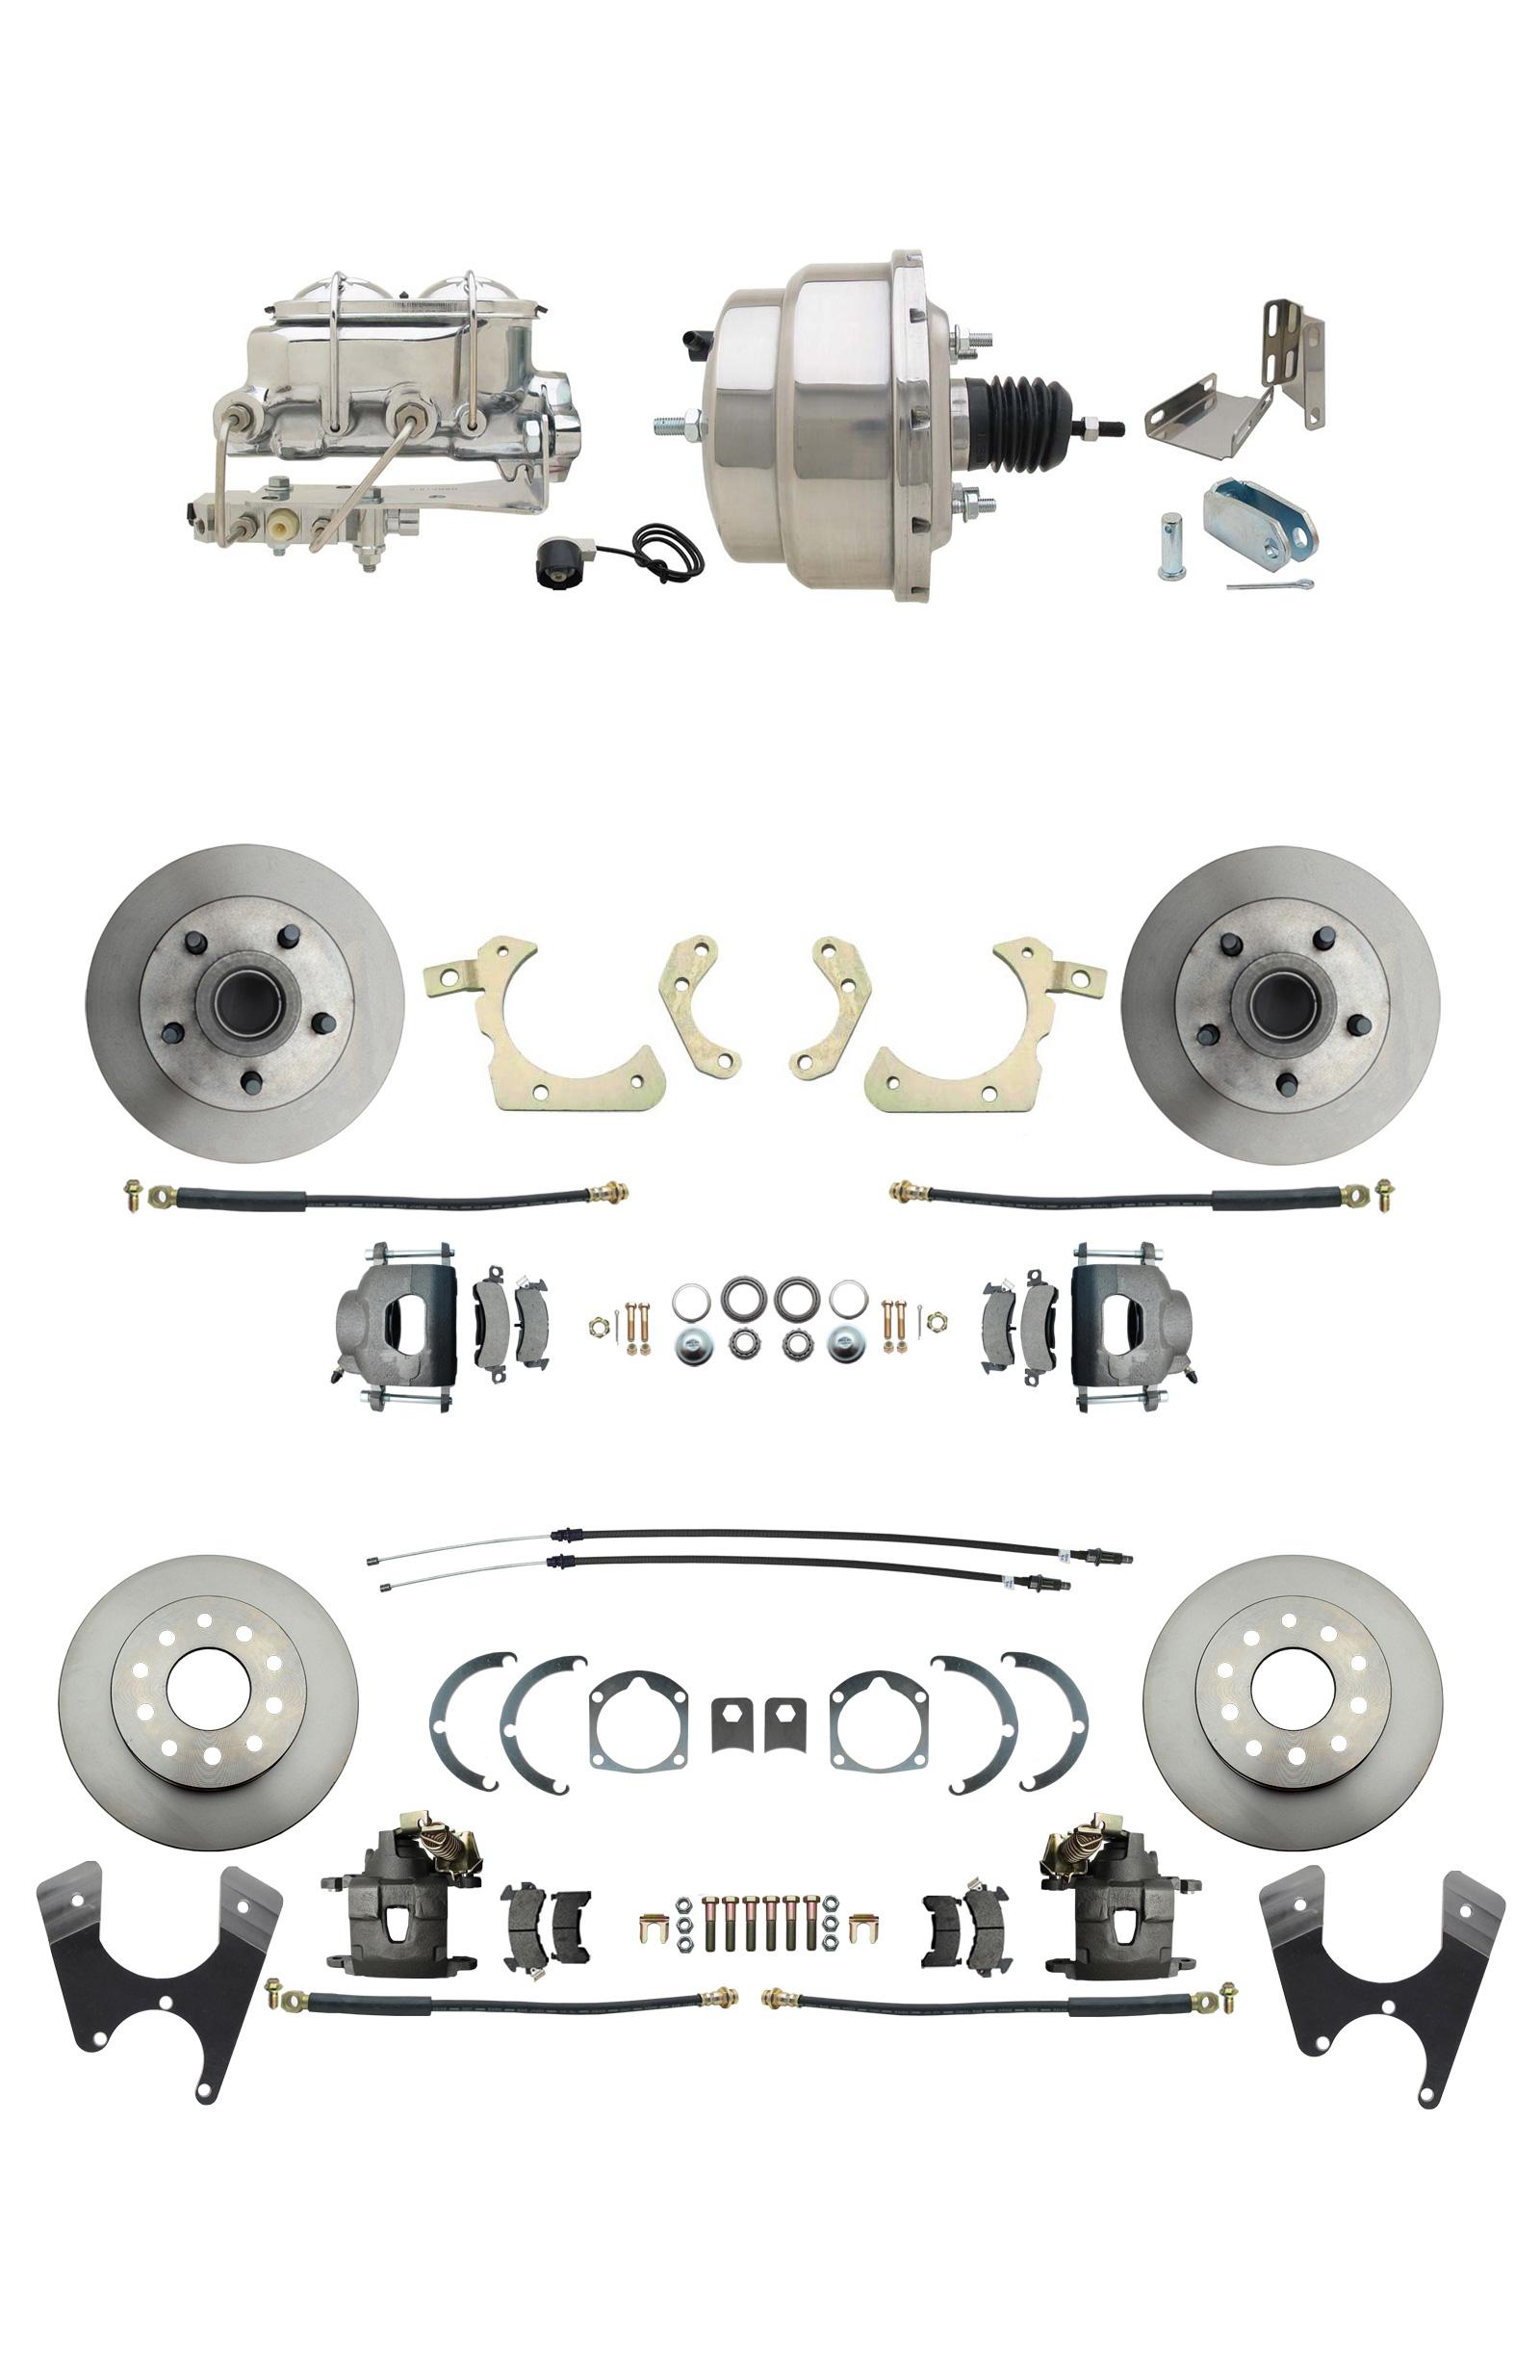 1959-1964 GM Full Size Front & Rear Power Disc Brake Kit (Impala, Bel Air, Biscayne) & 8 Dual Stainless Steel Conversion Kit W/ Chrome Master Cylinder Bottom Mount Disc/ Drum Proportioning Valve Kit